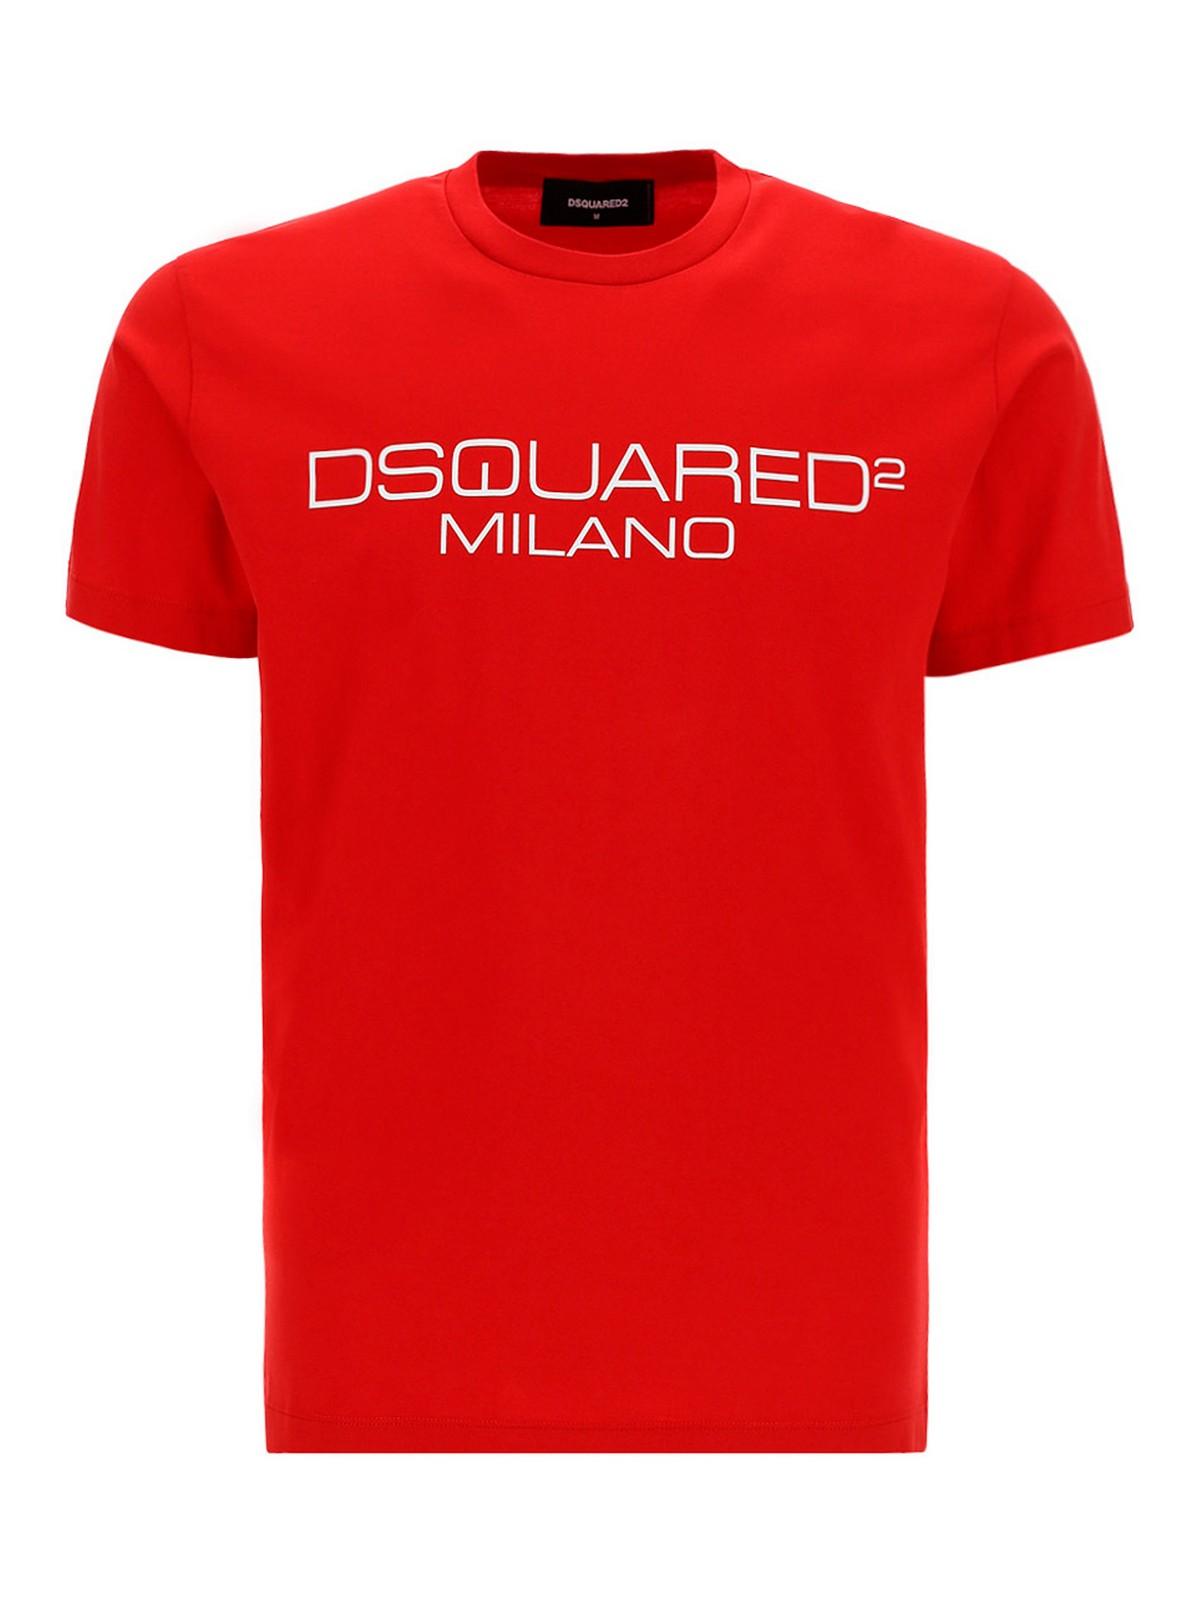 Dsquared2 Clothing LOGO PRINT COTTON T-SHIRT